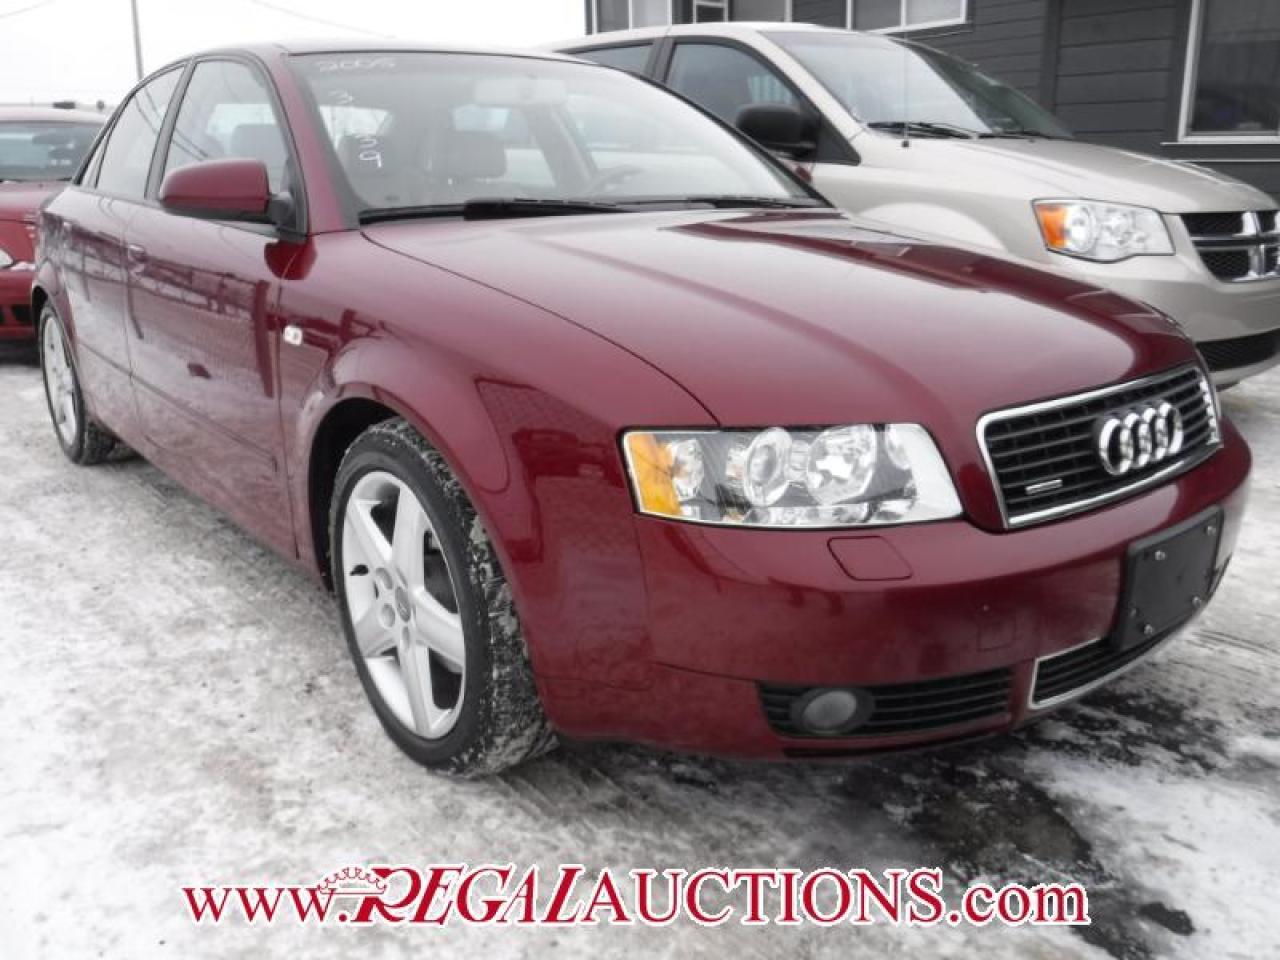 Photo of Red 2005 Audi A4  4D SEDAN QTRO 1.8T